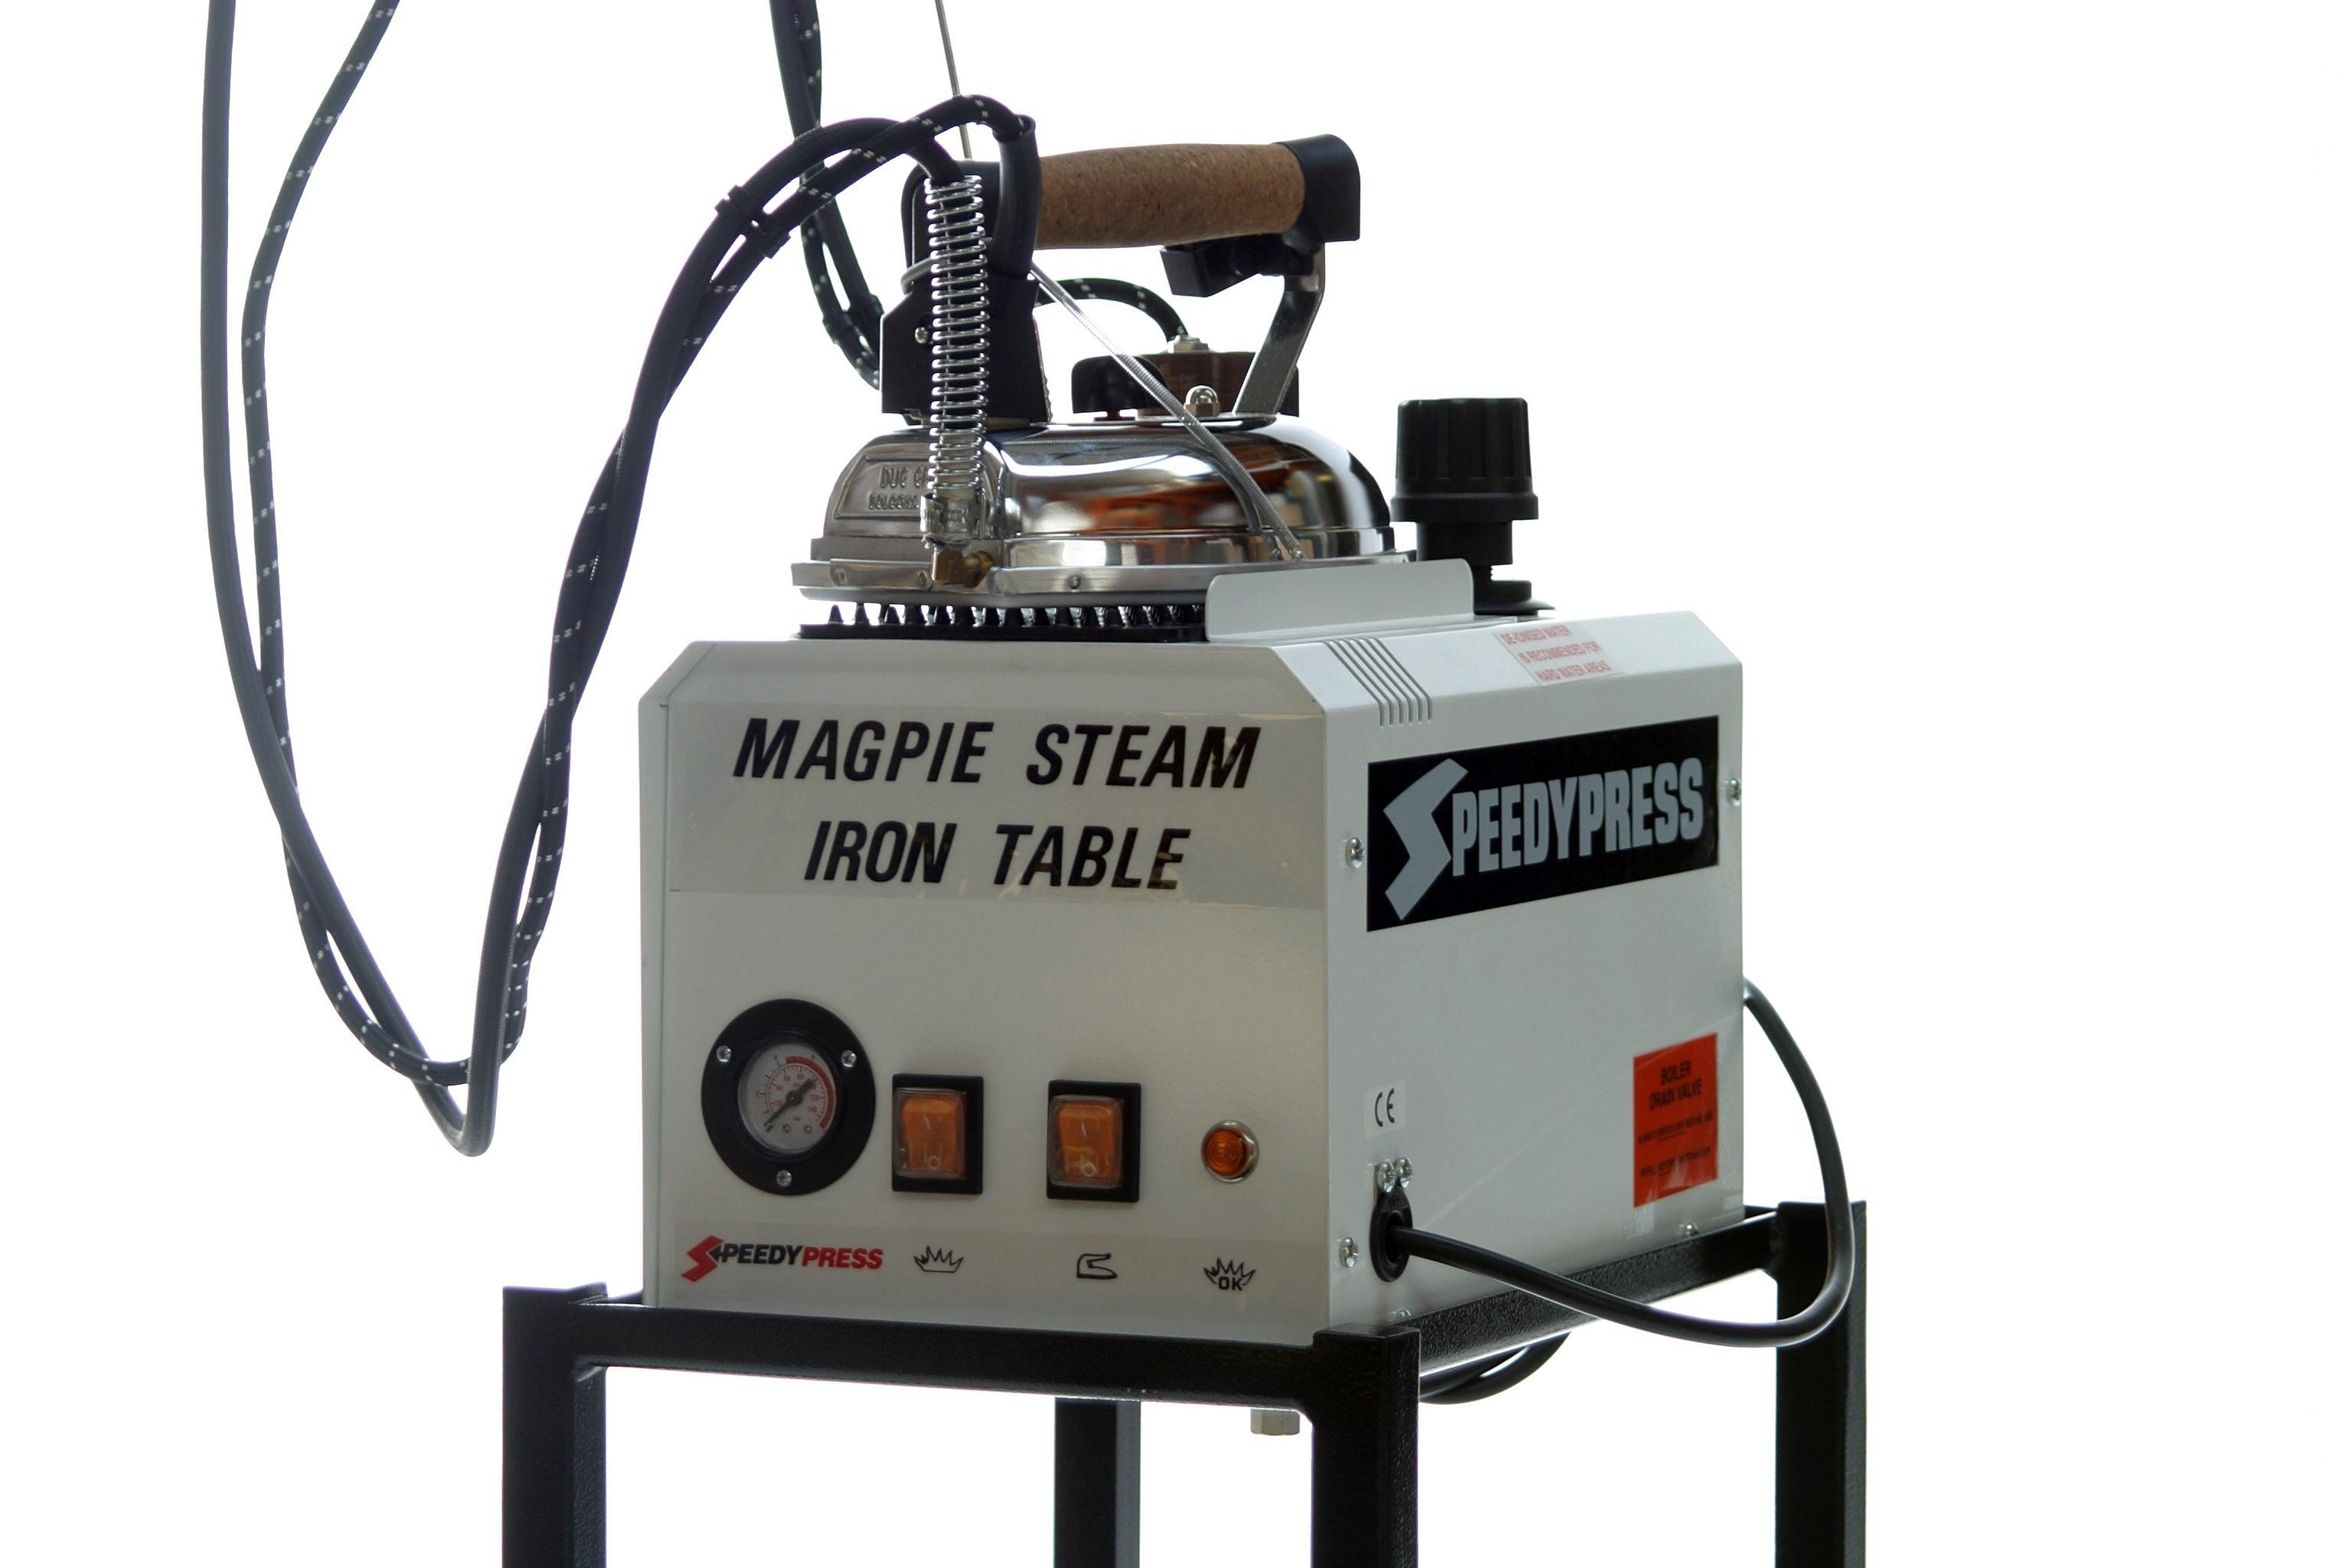 Magpie 5-litre British Ironing Boiler, Iron & Blow Down Bottle